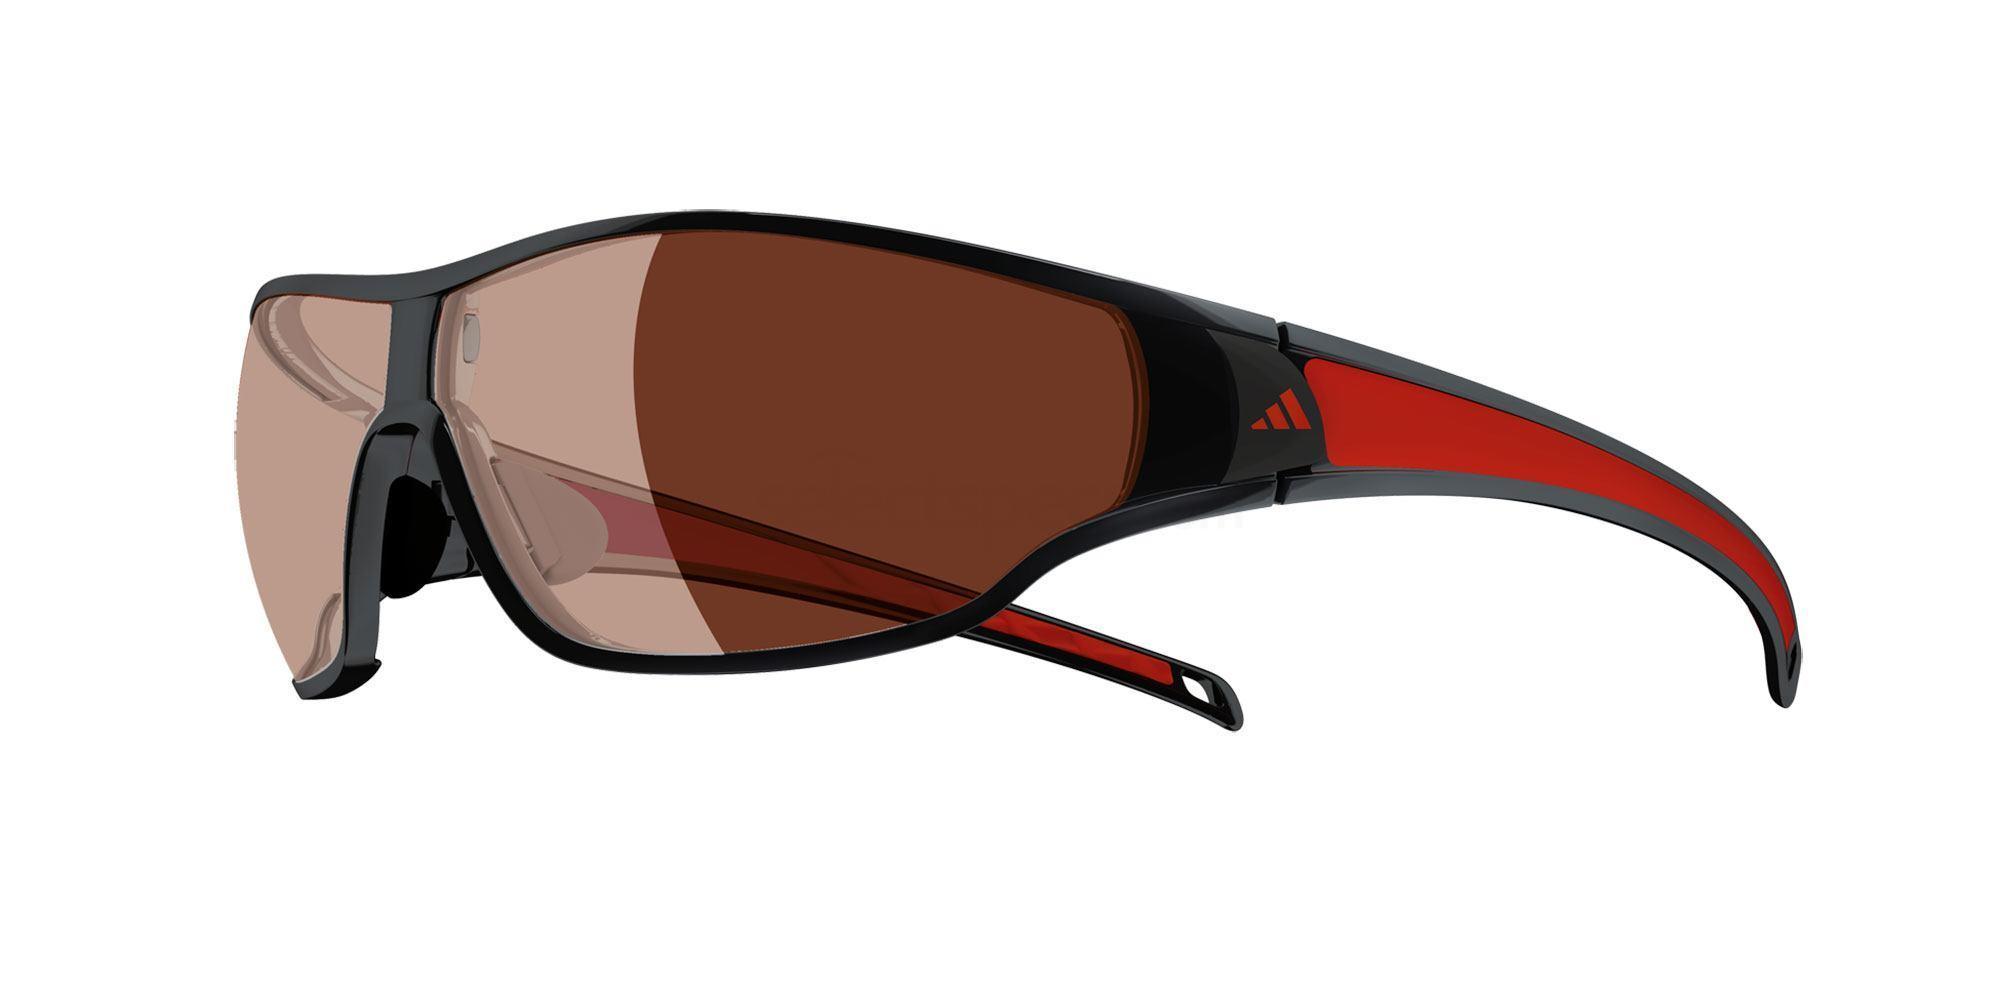 00 6051 a192 Tycane S Polarized Sunglasses, Adidas